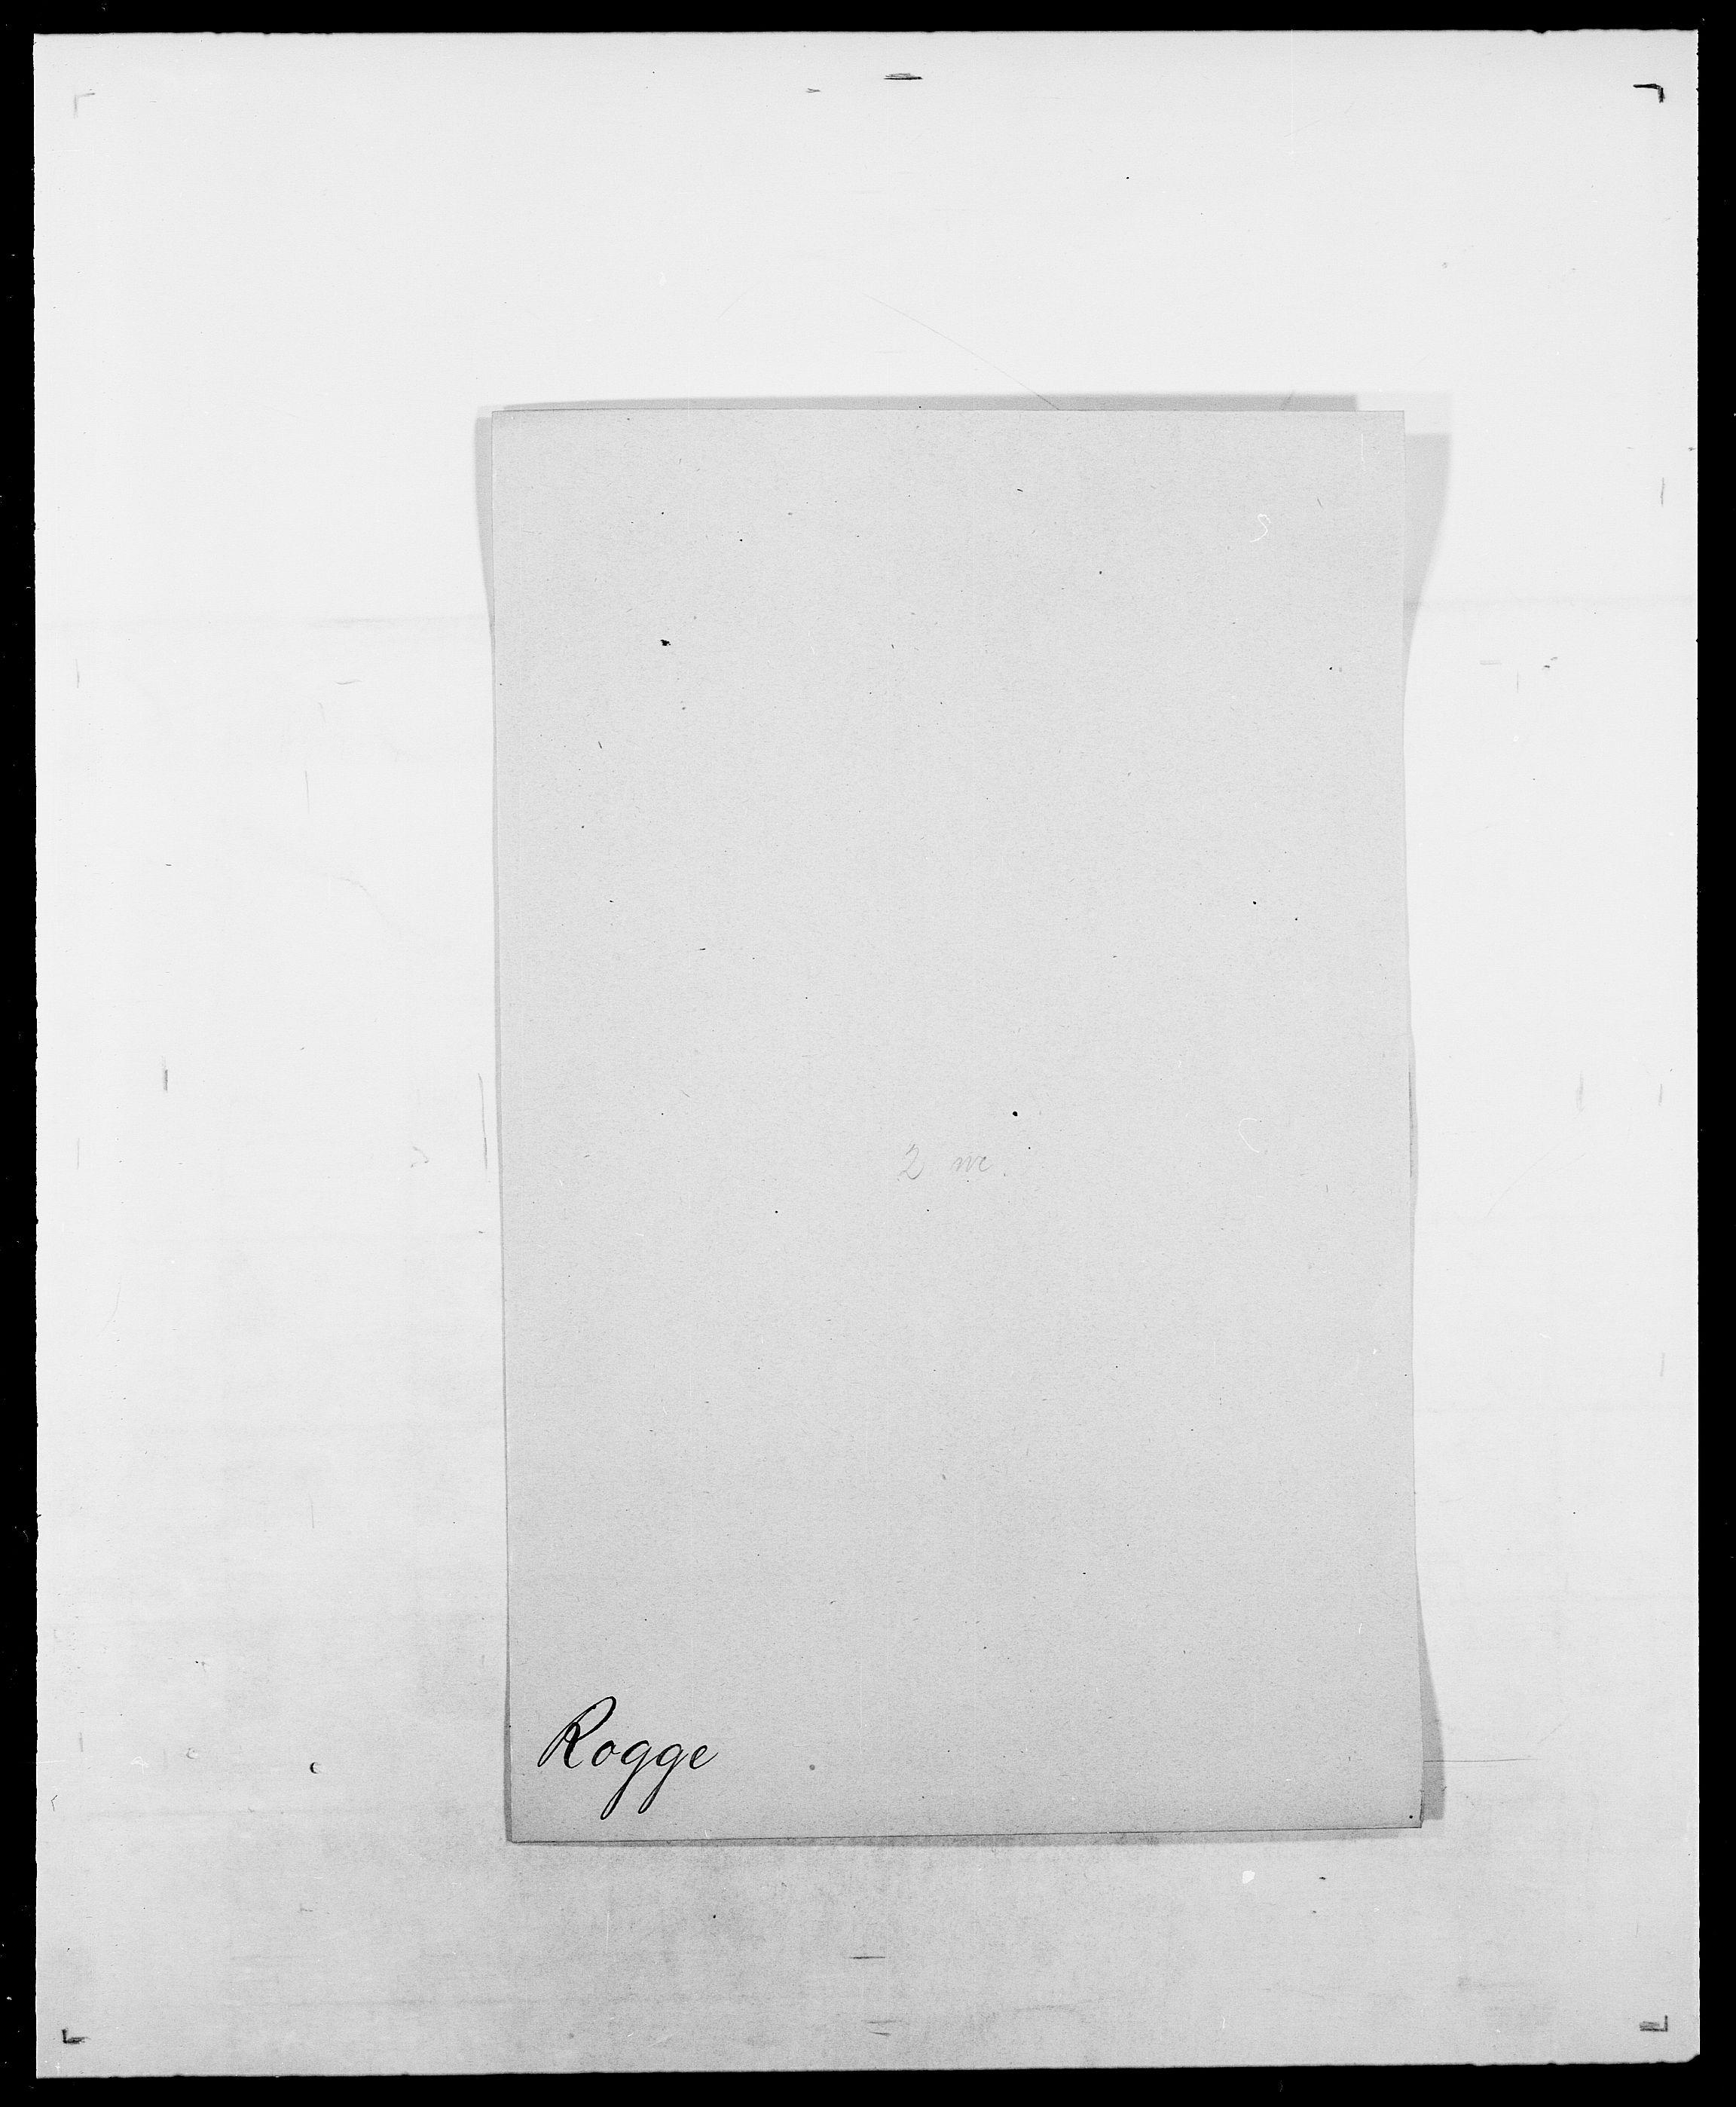 SAO, Delgobe, Charles Antoine - samling, D/Da/L0033: Roald - Røyem, s. 75